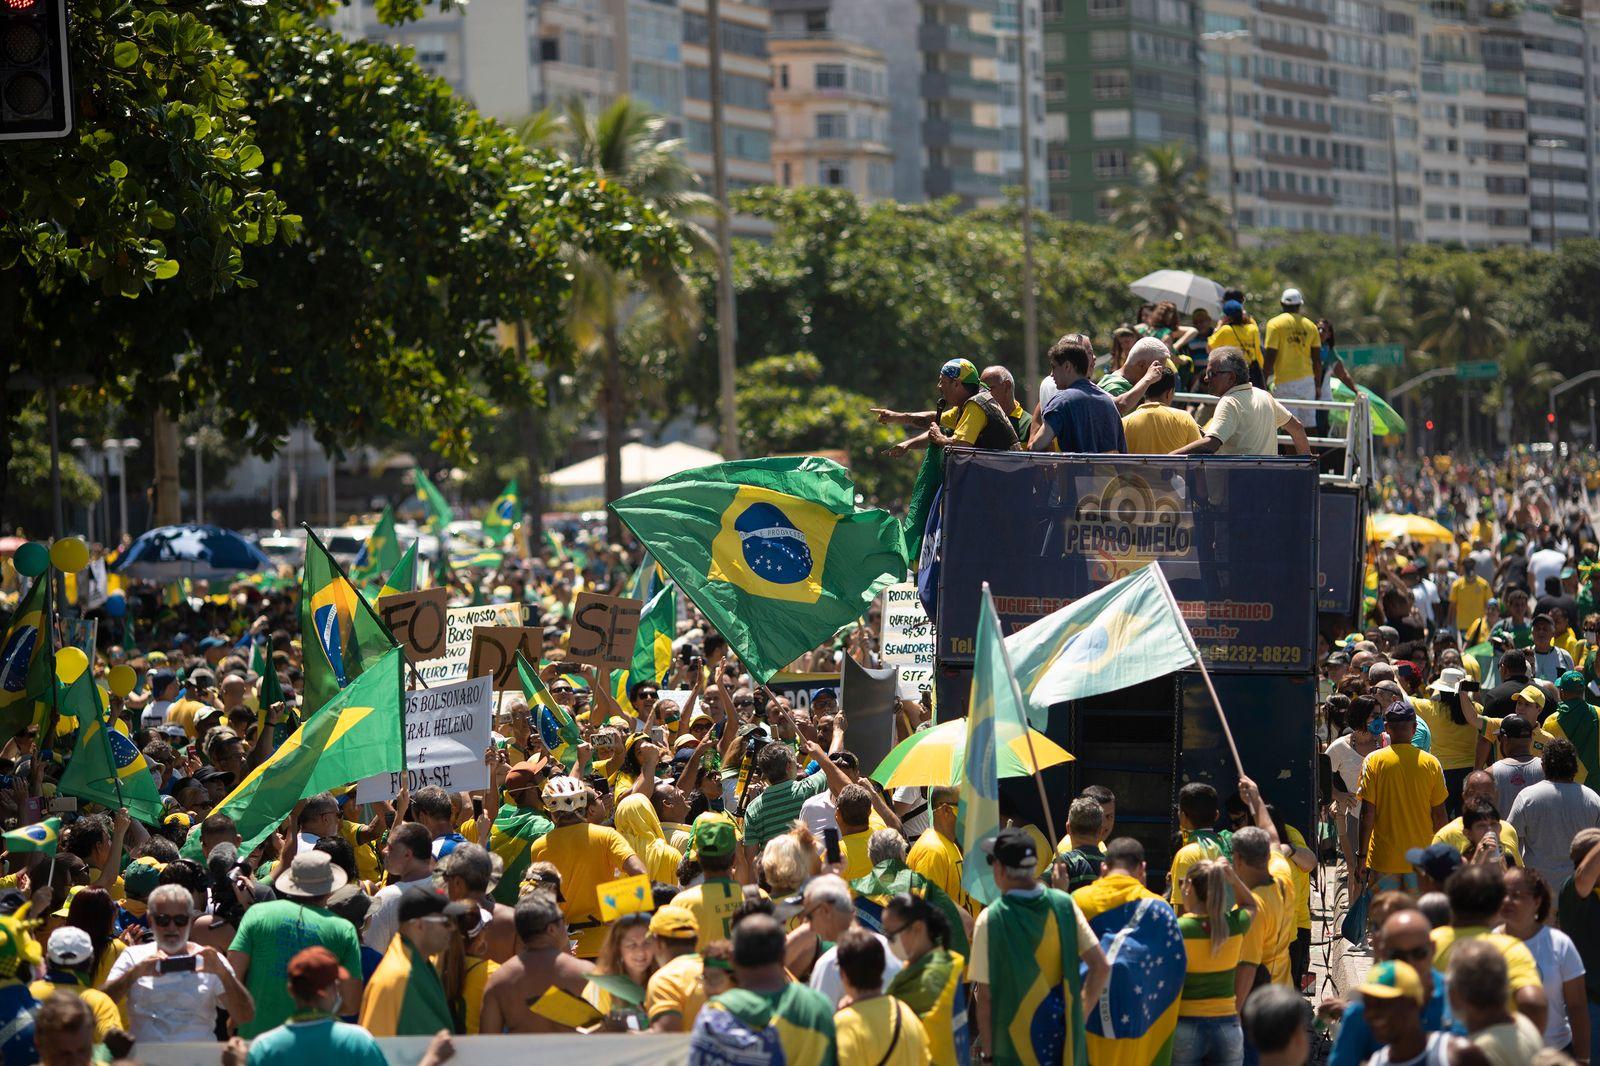 Bolsonaro-Anhänger demonstrieren in Brasilien